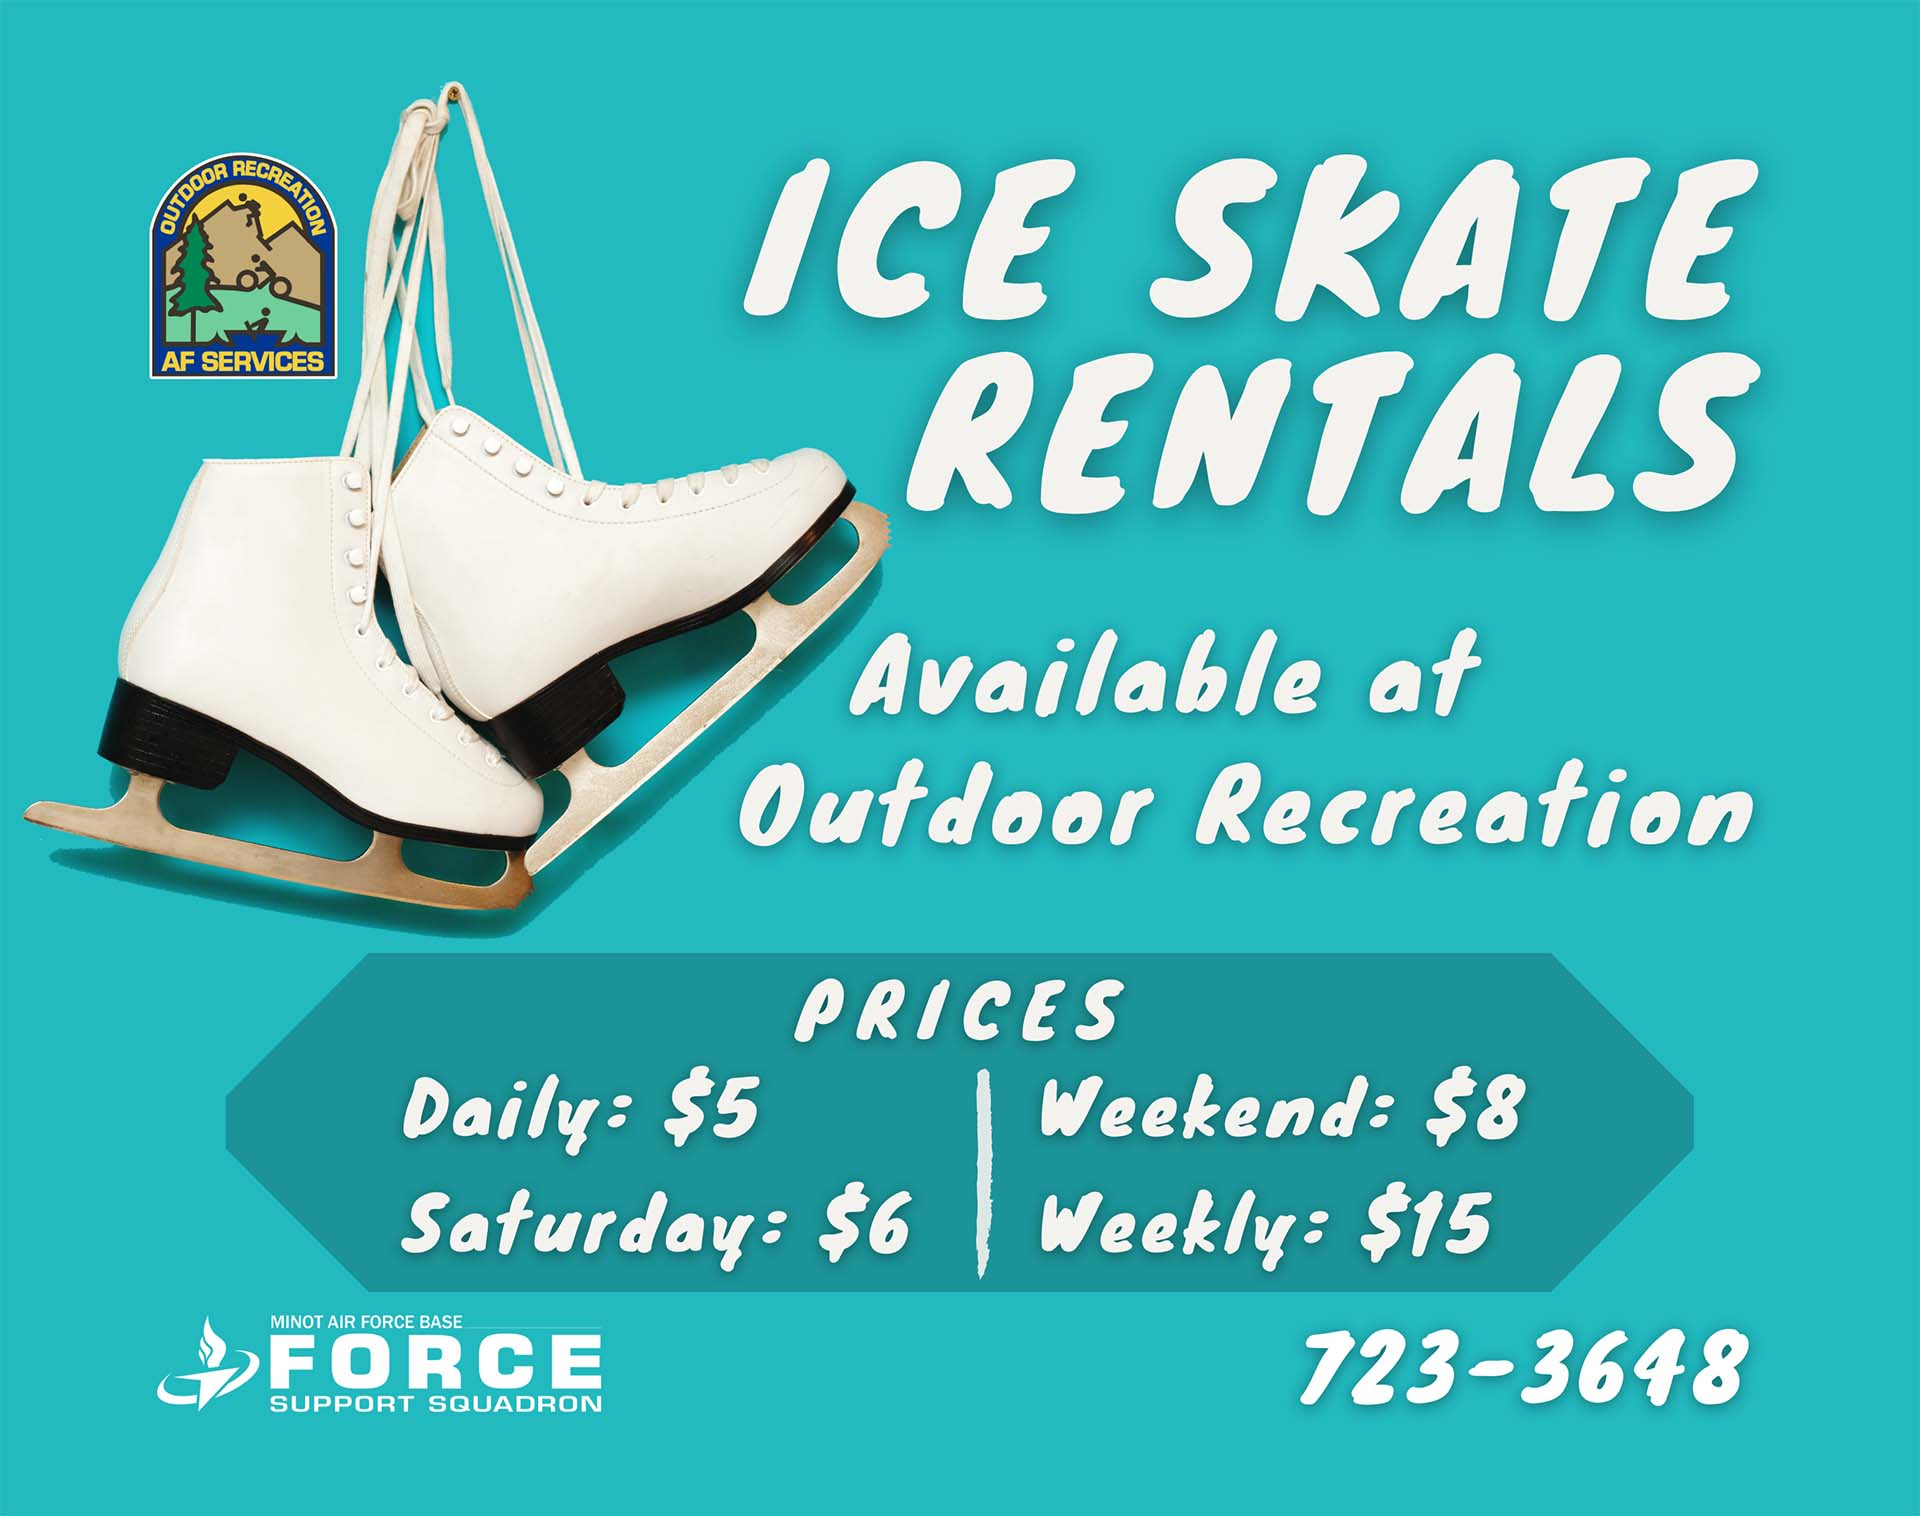 Outdoor Recreation - Ice Skate Rentals